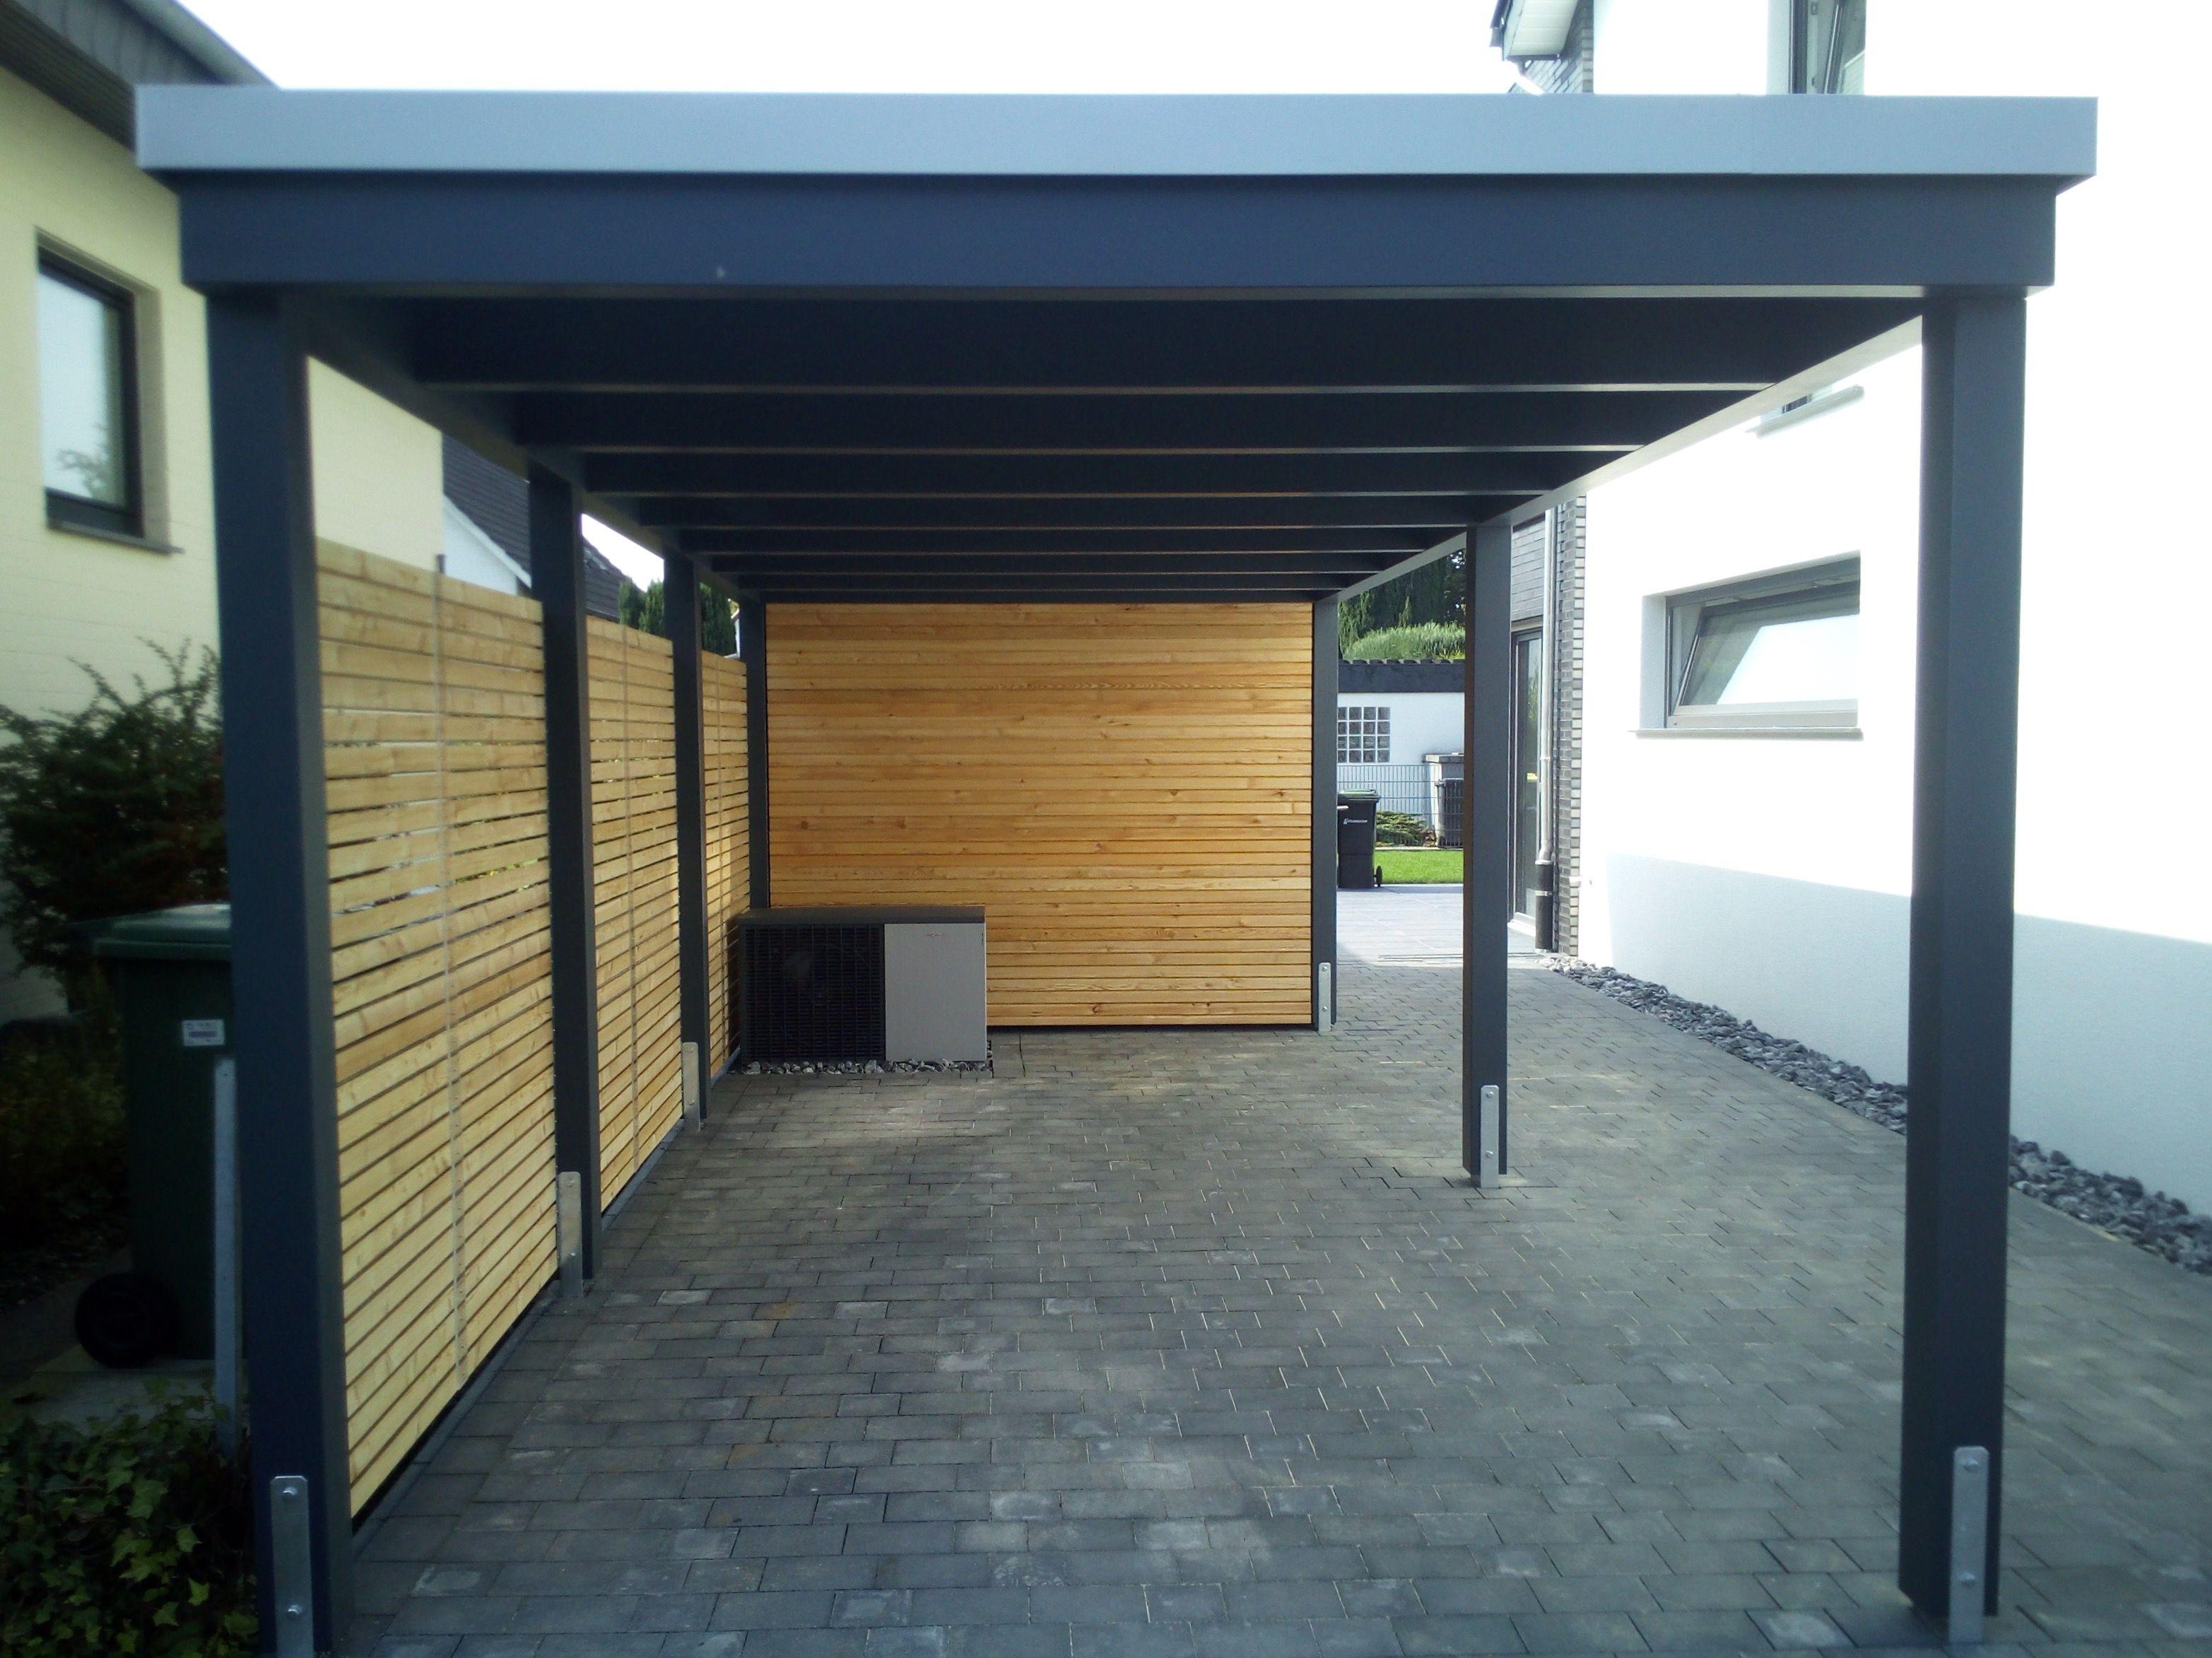 8bc8aa86b1729b2a141102ef461a311e Inspiration Sichtschutz Rhombus Selber Bauen Konzept